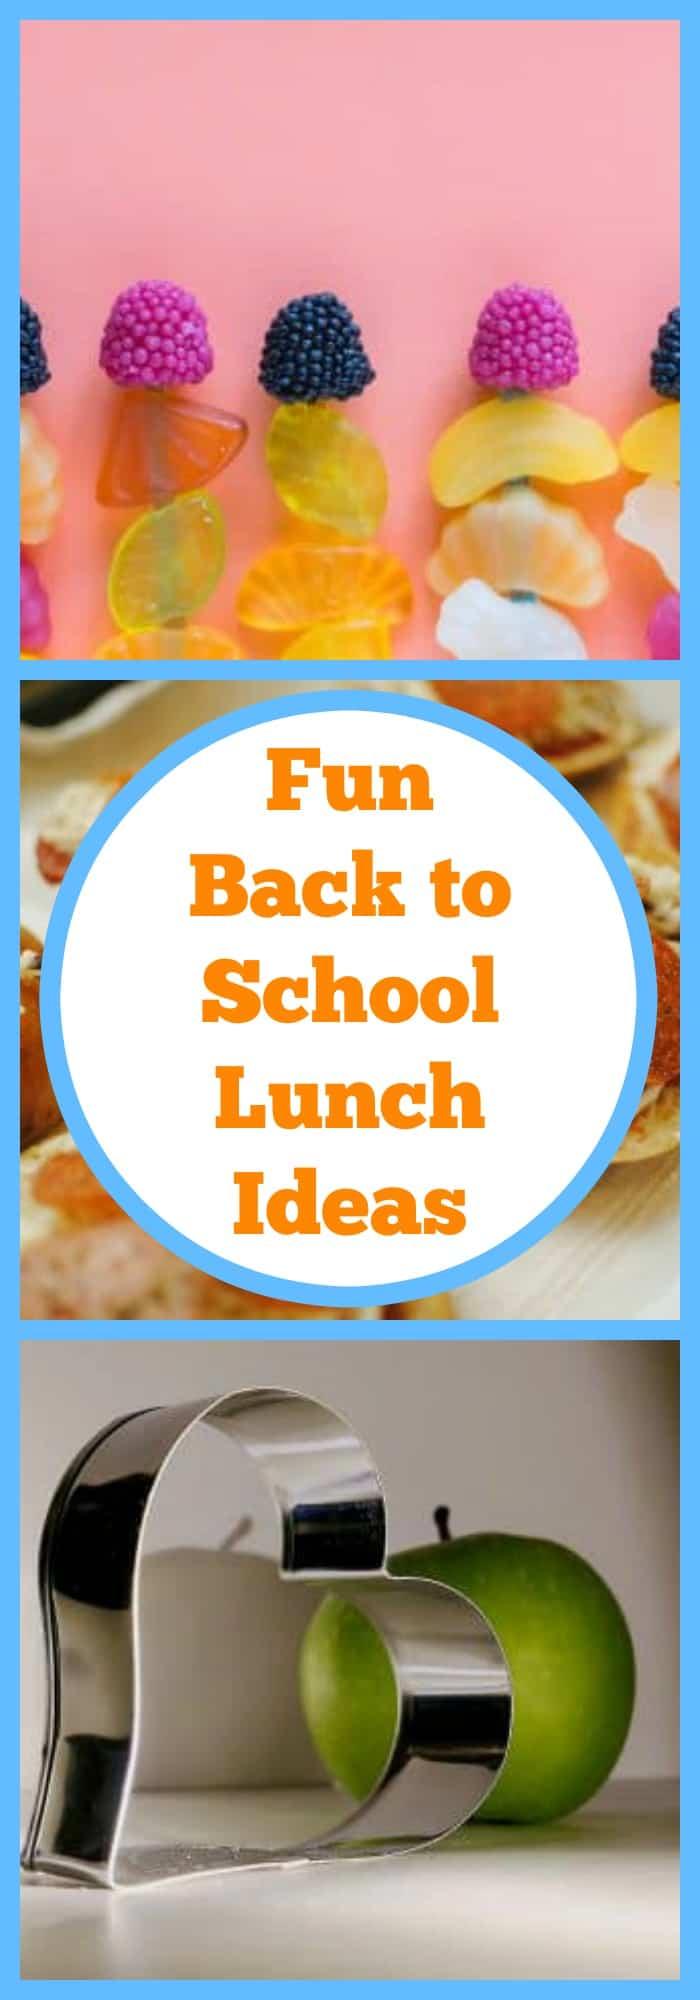 Fun Back to School Lunch Ideas